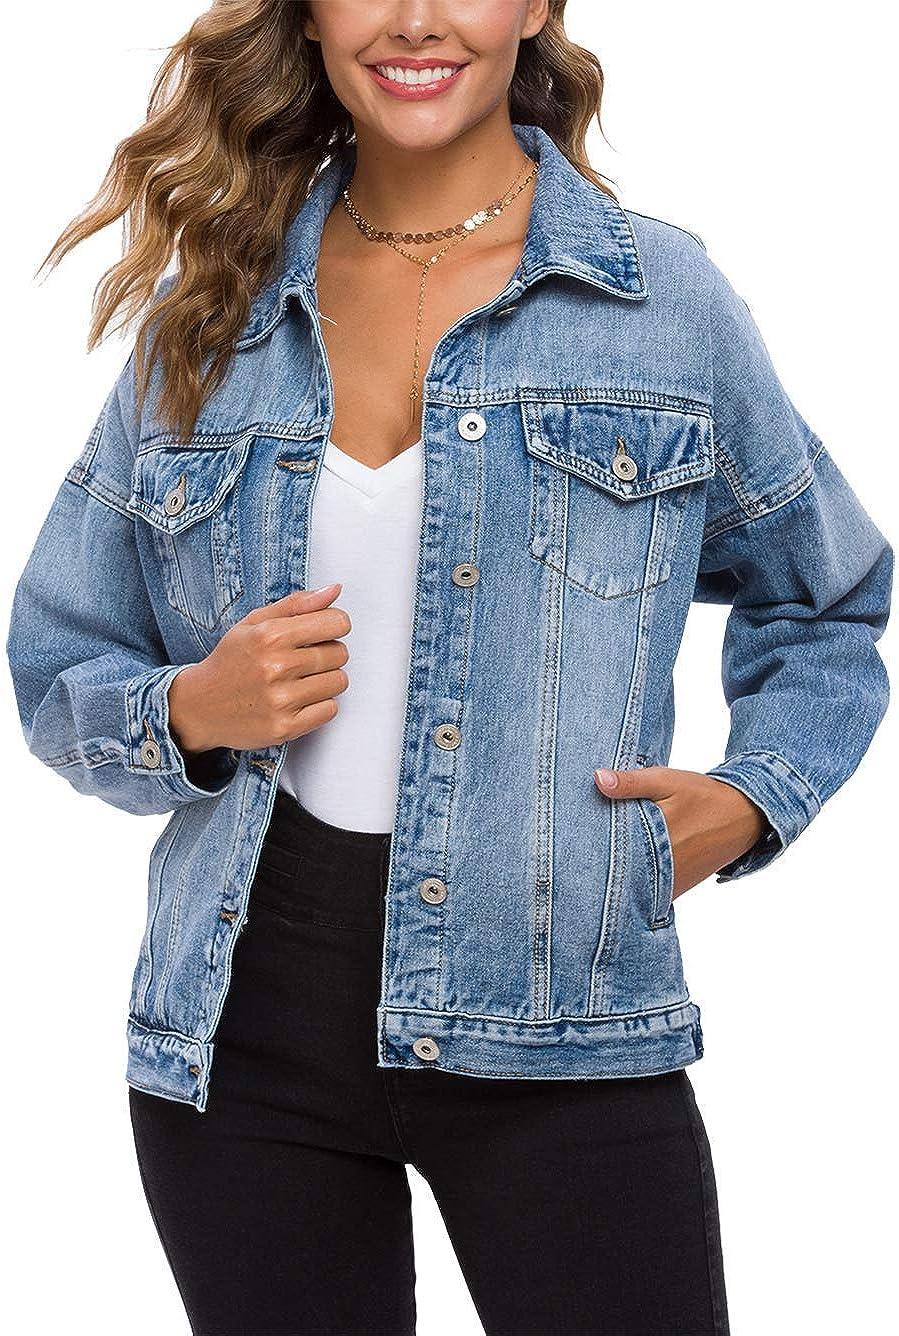 Cantonwalker Loose Women's Denim Jean Jacket,Oversize Vintage denim jacket,Long Sleeve Boyfriend Denim Jacket coat…